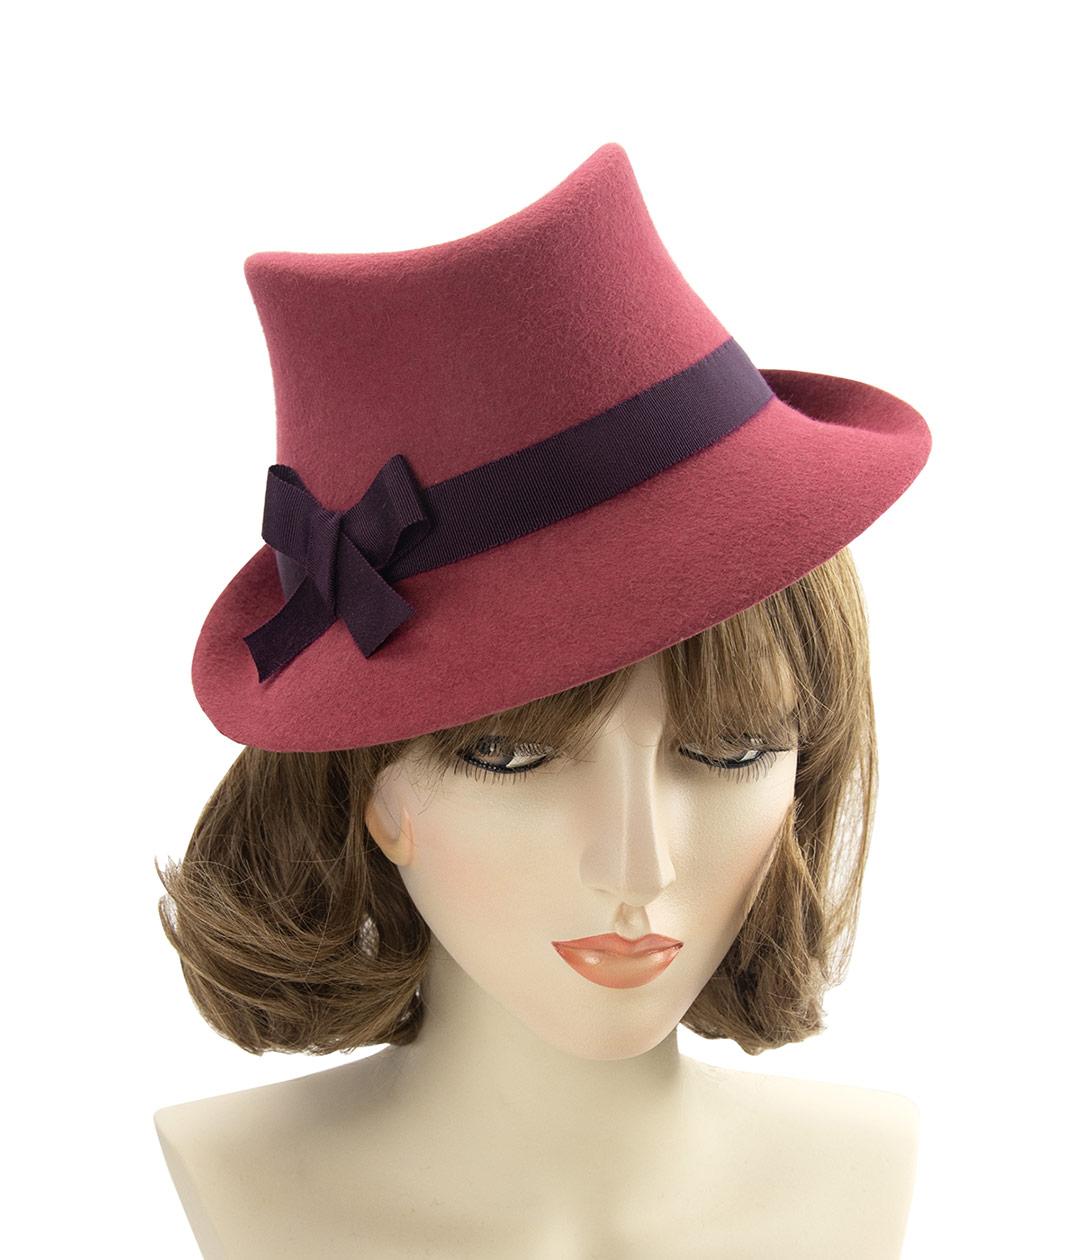 Cinnamon red 1940s-style ladies fedora hat